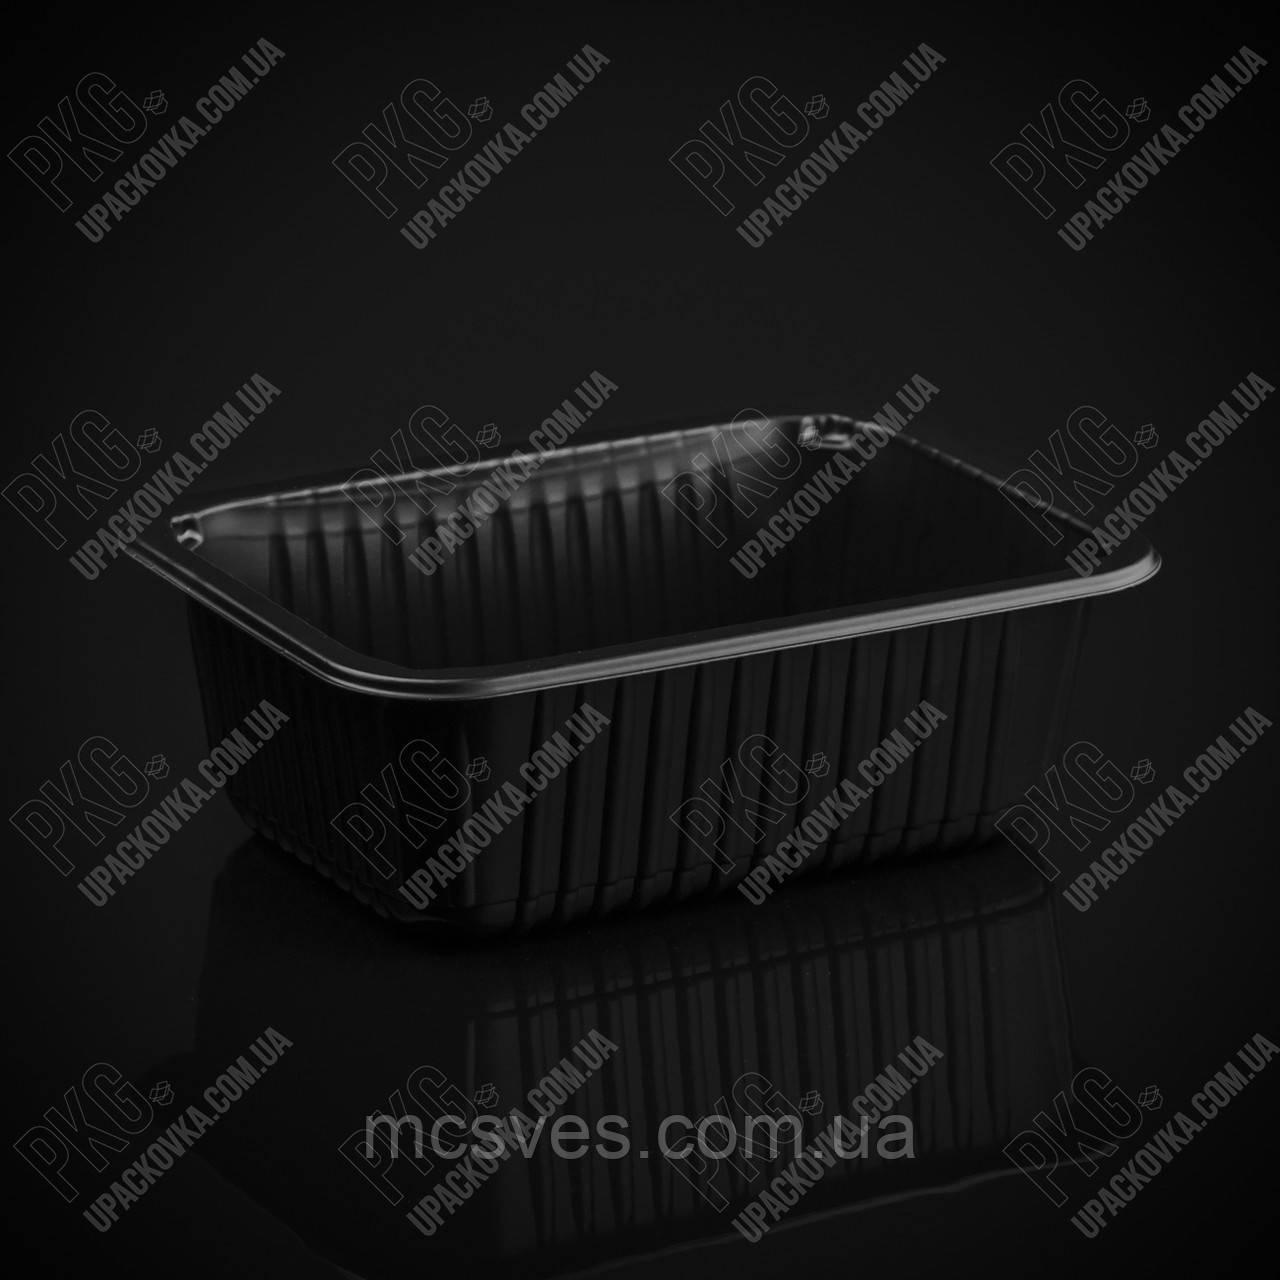 Контейнер КК-503Б, РР, чорний, 1100 мл